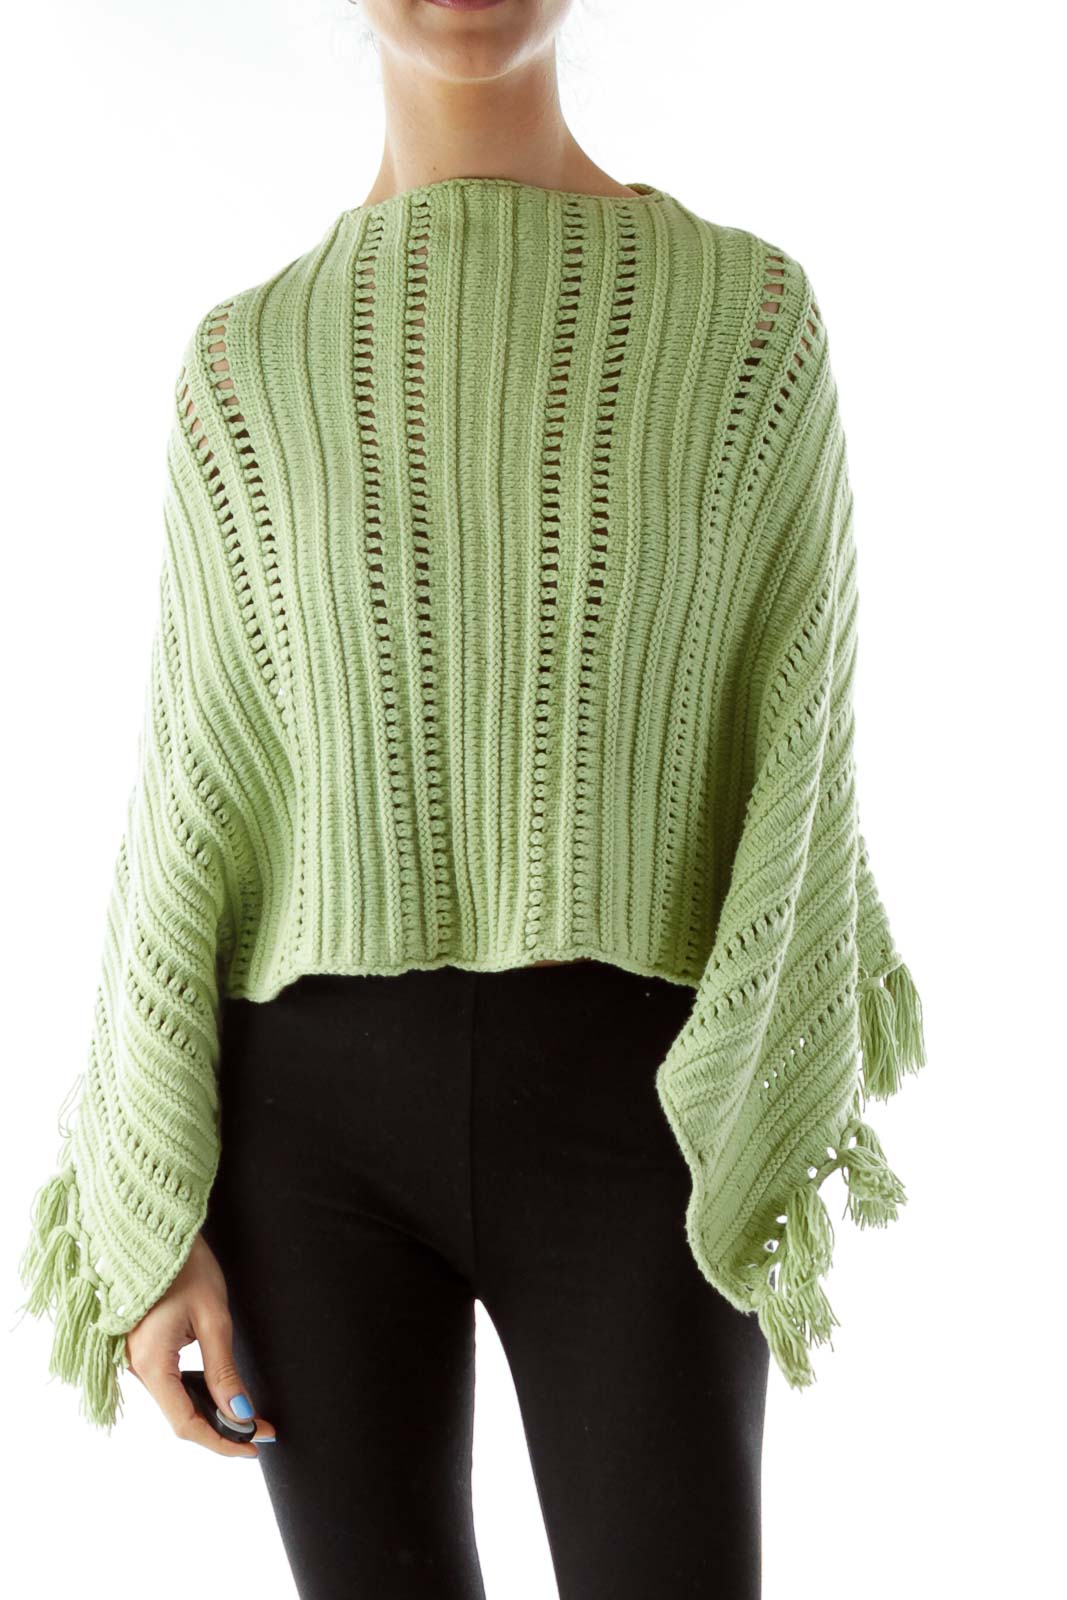 Green Crocheted Poncho w/ Tassels Front